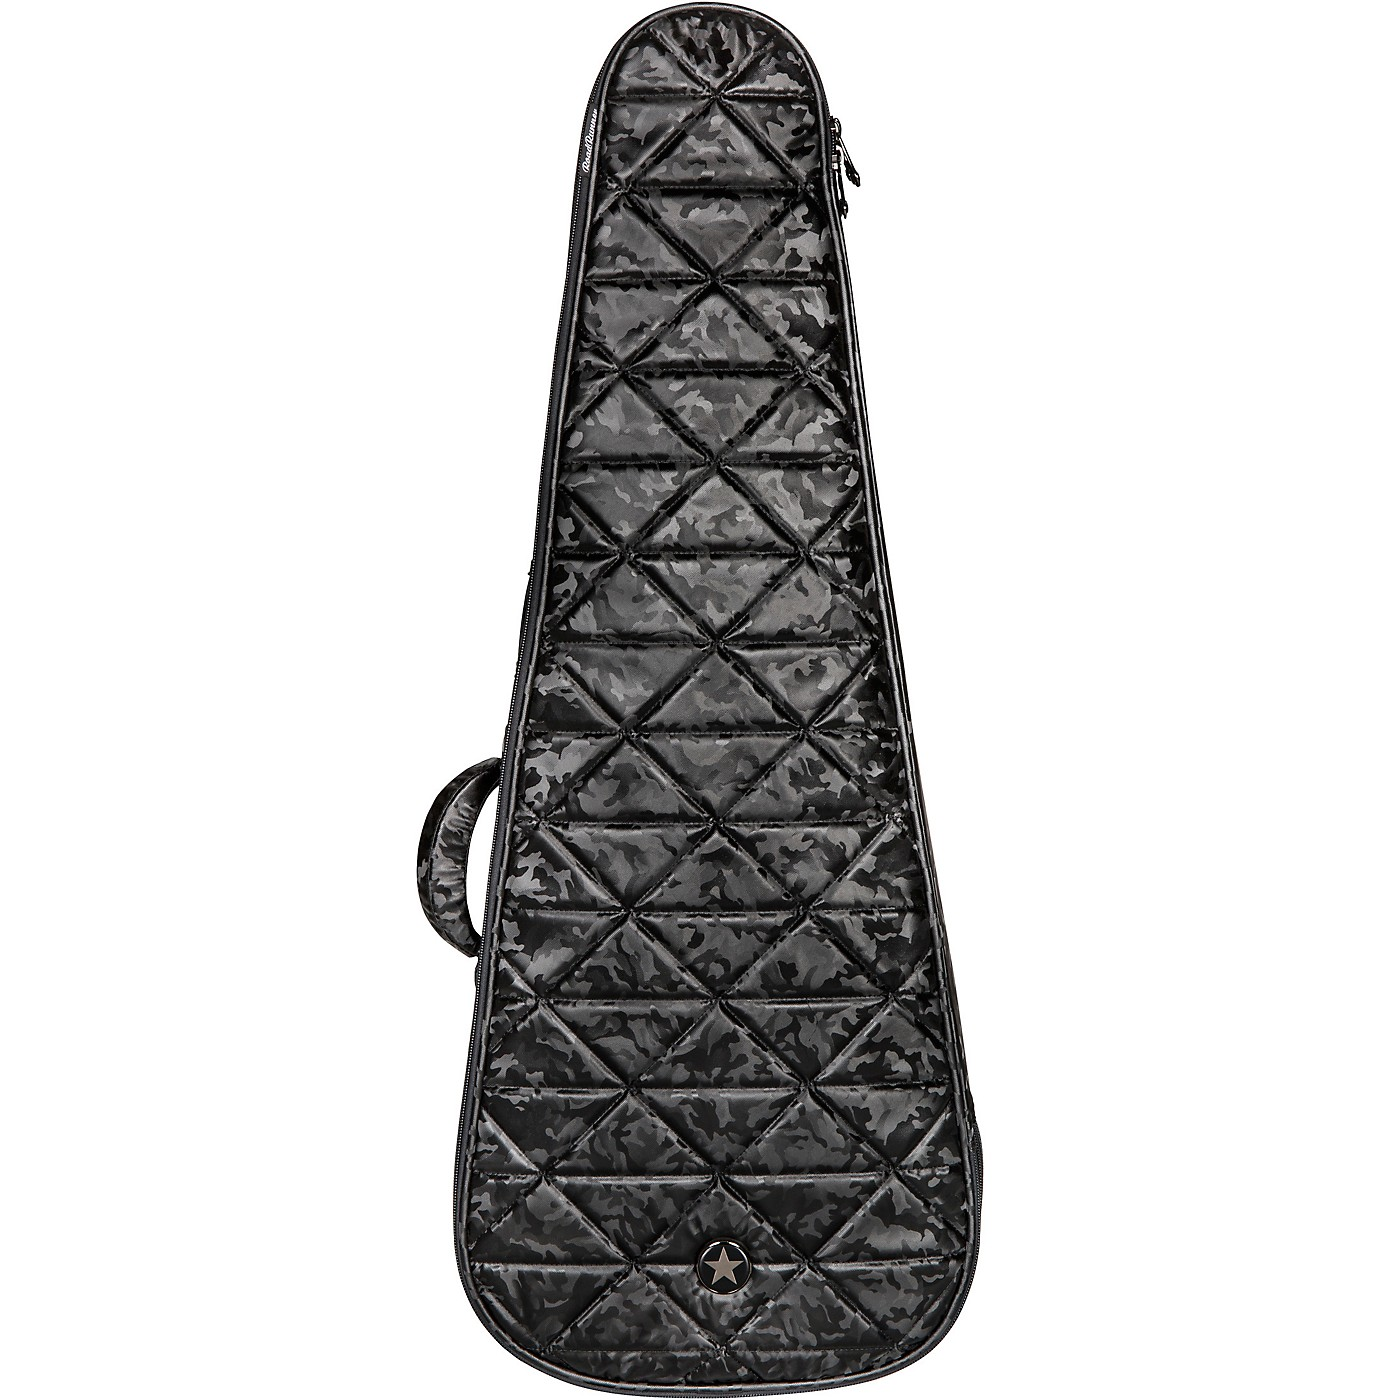 Road Runner RR5TEG-BSC Highway Premium Electric Guitar Gig Bag Black Stealth Cammo thumbnail